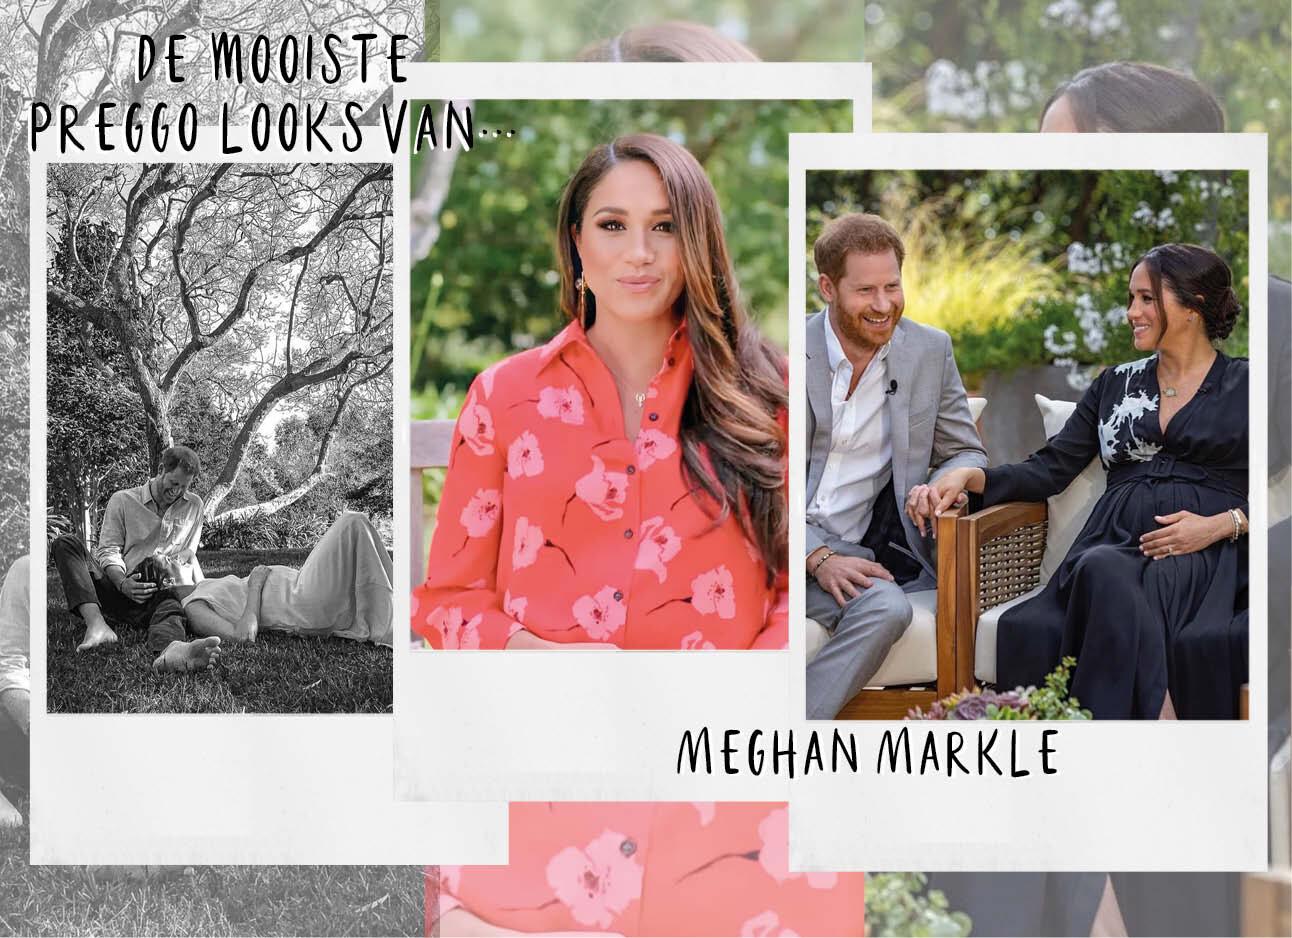 De mooiste preggo looks van Meghan Markle